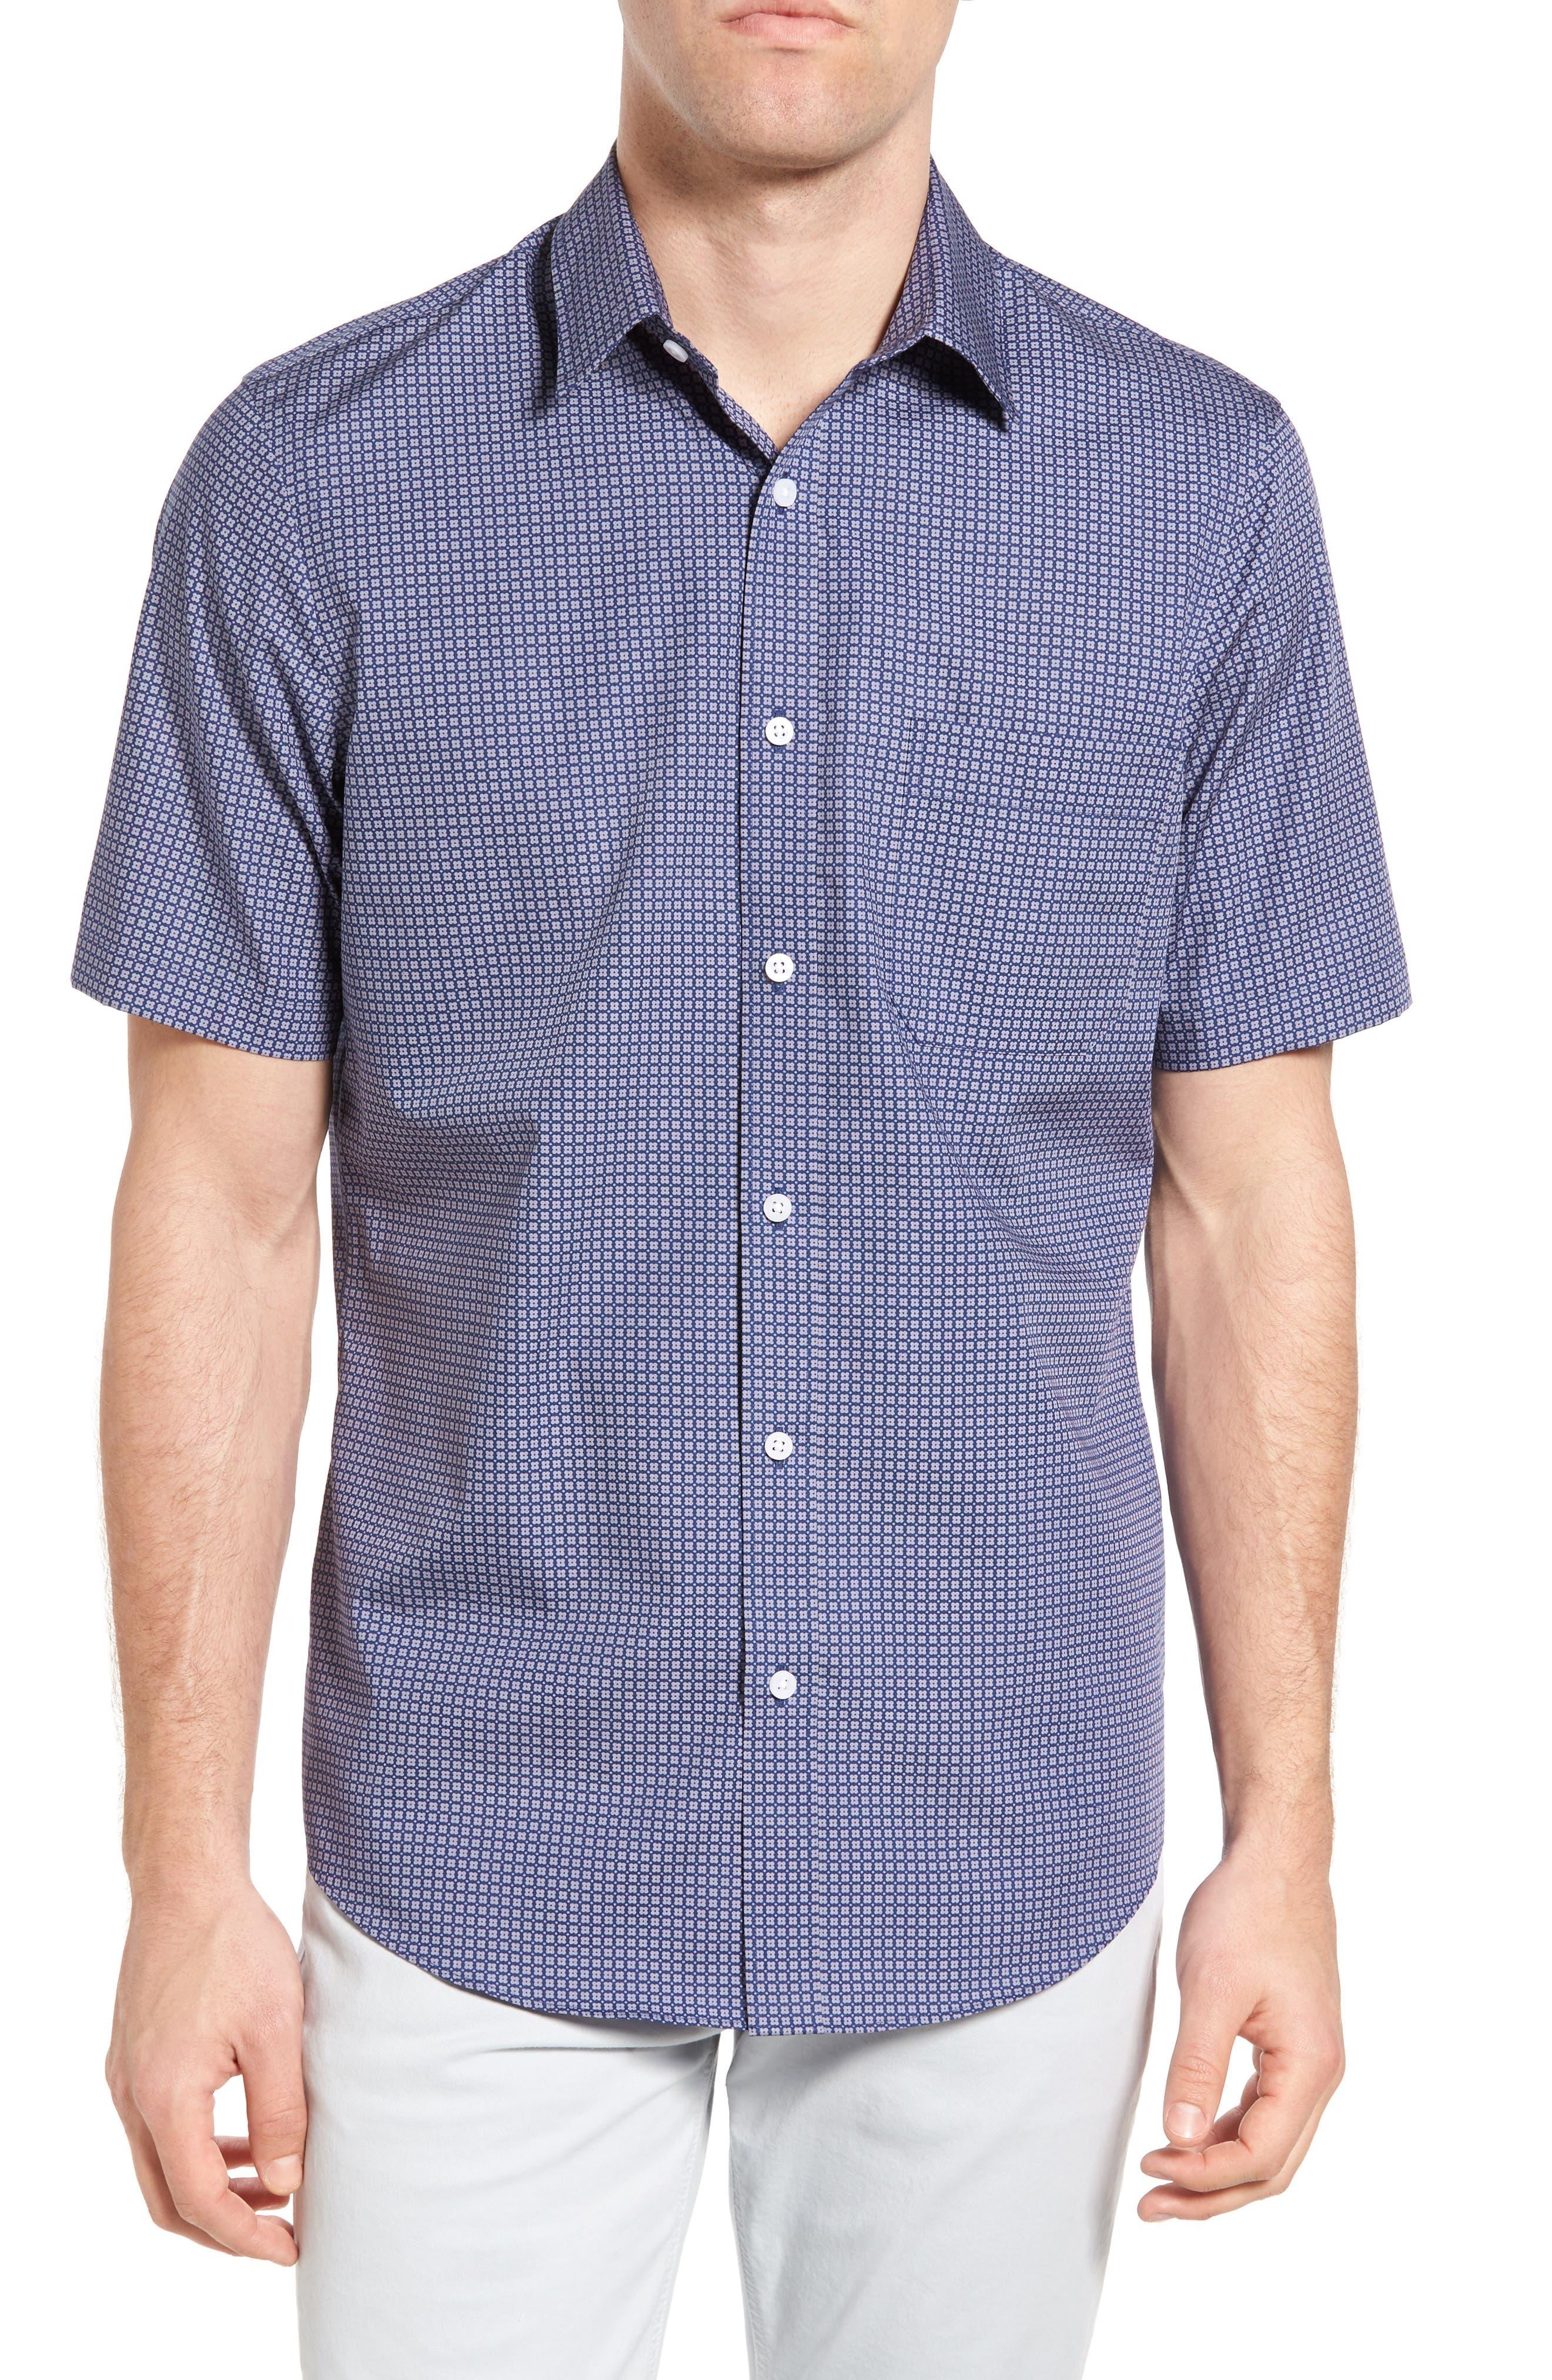 NORDSTROM MENS SHOP Regular Fit Non-Iron Floral Print Sport Shirt